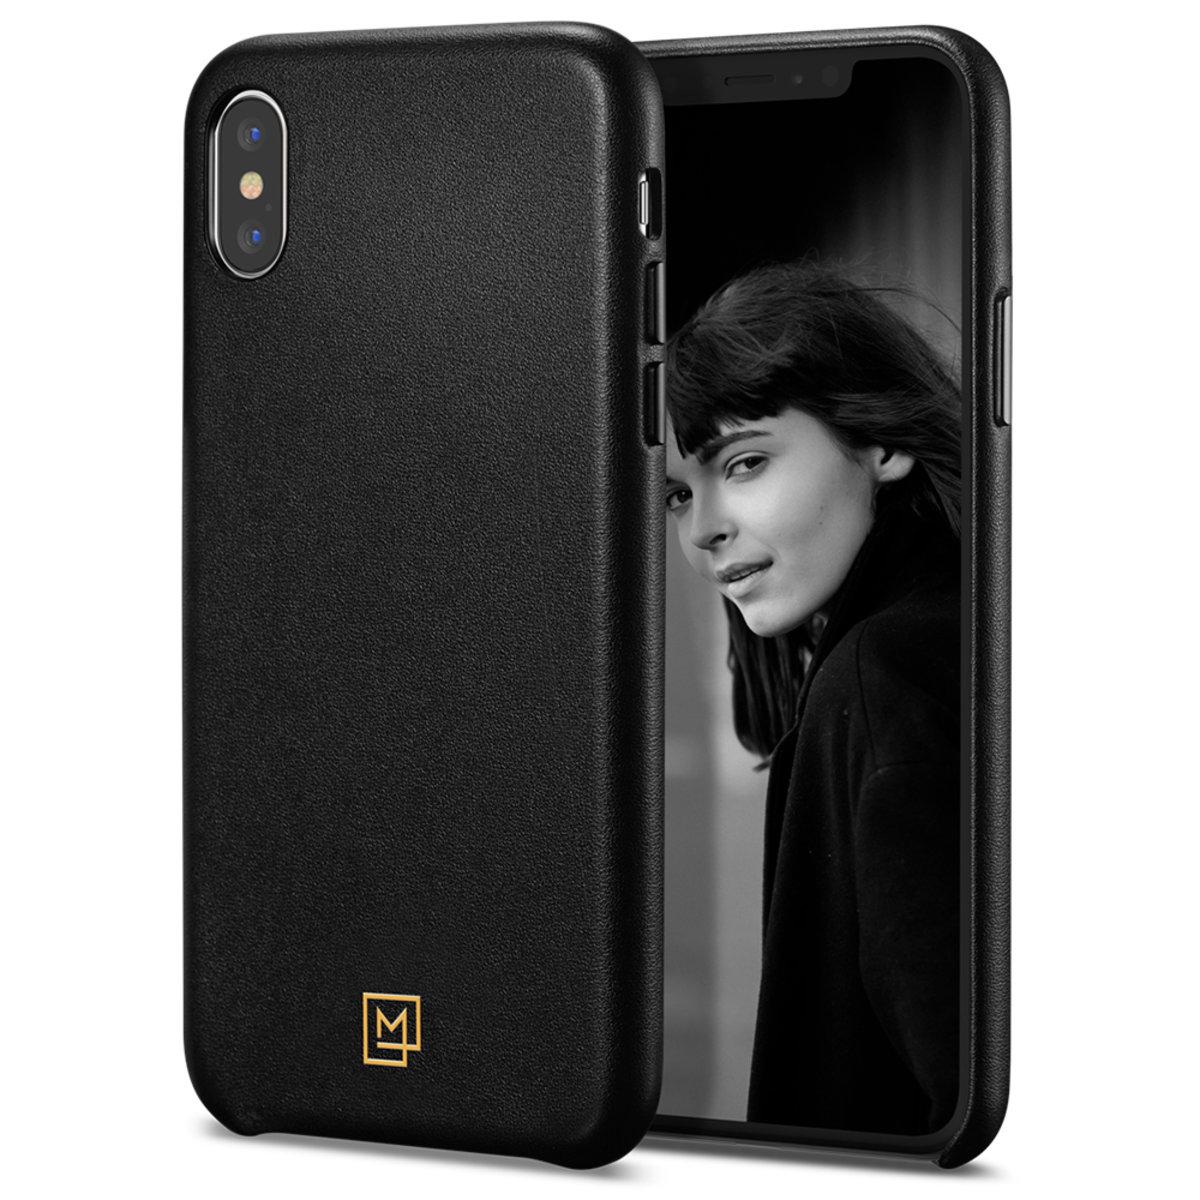 iPhone XS / X La Manon câlin 保護殼 - 黑